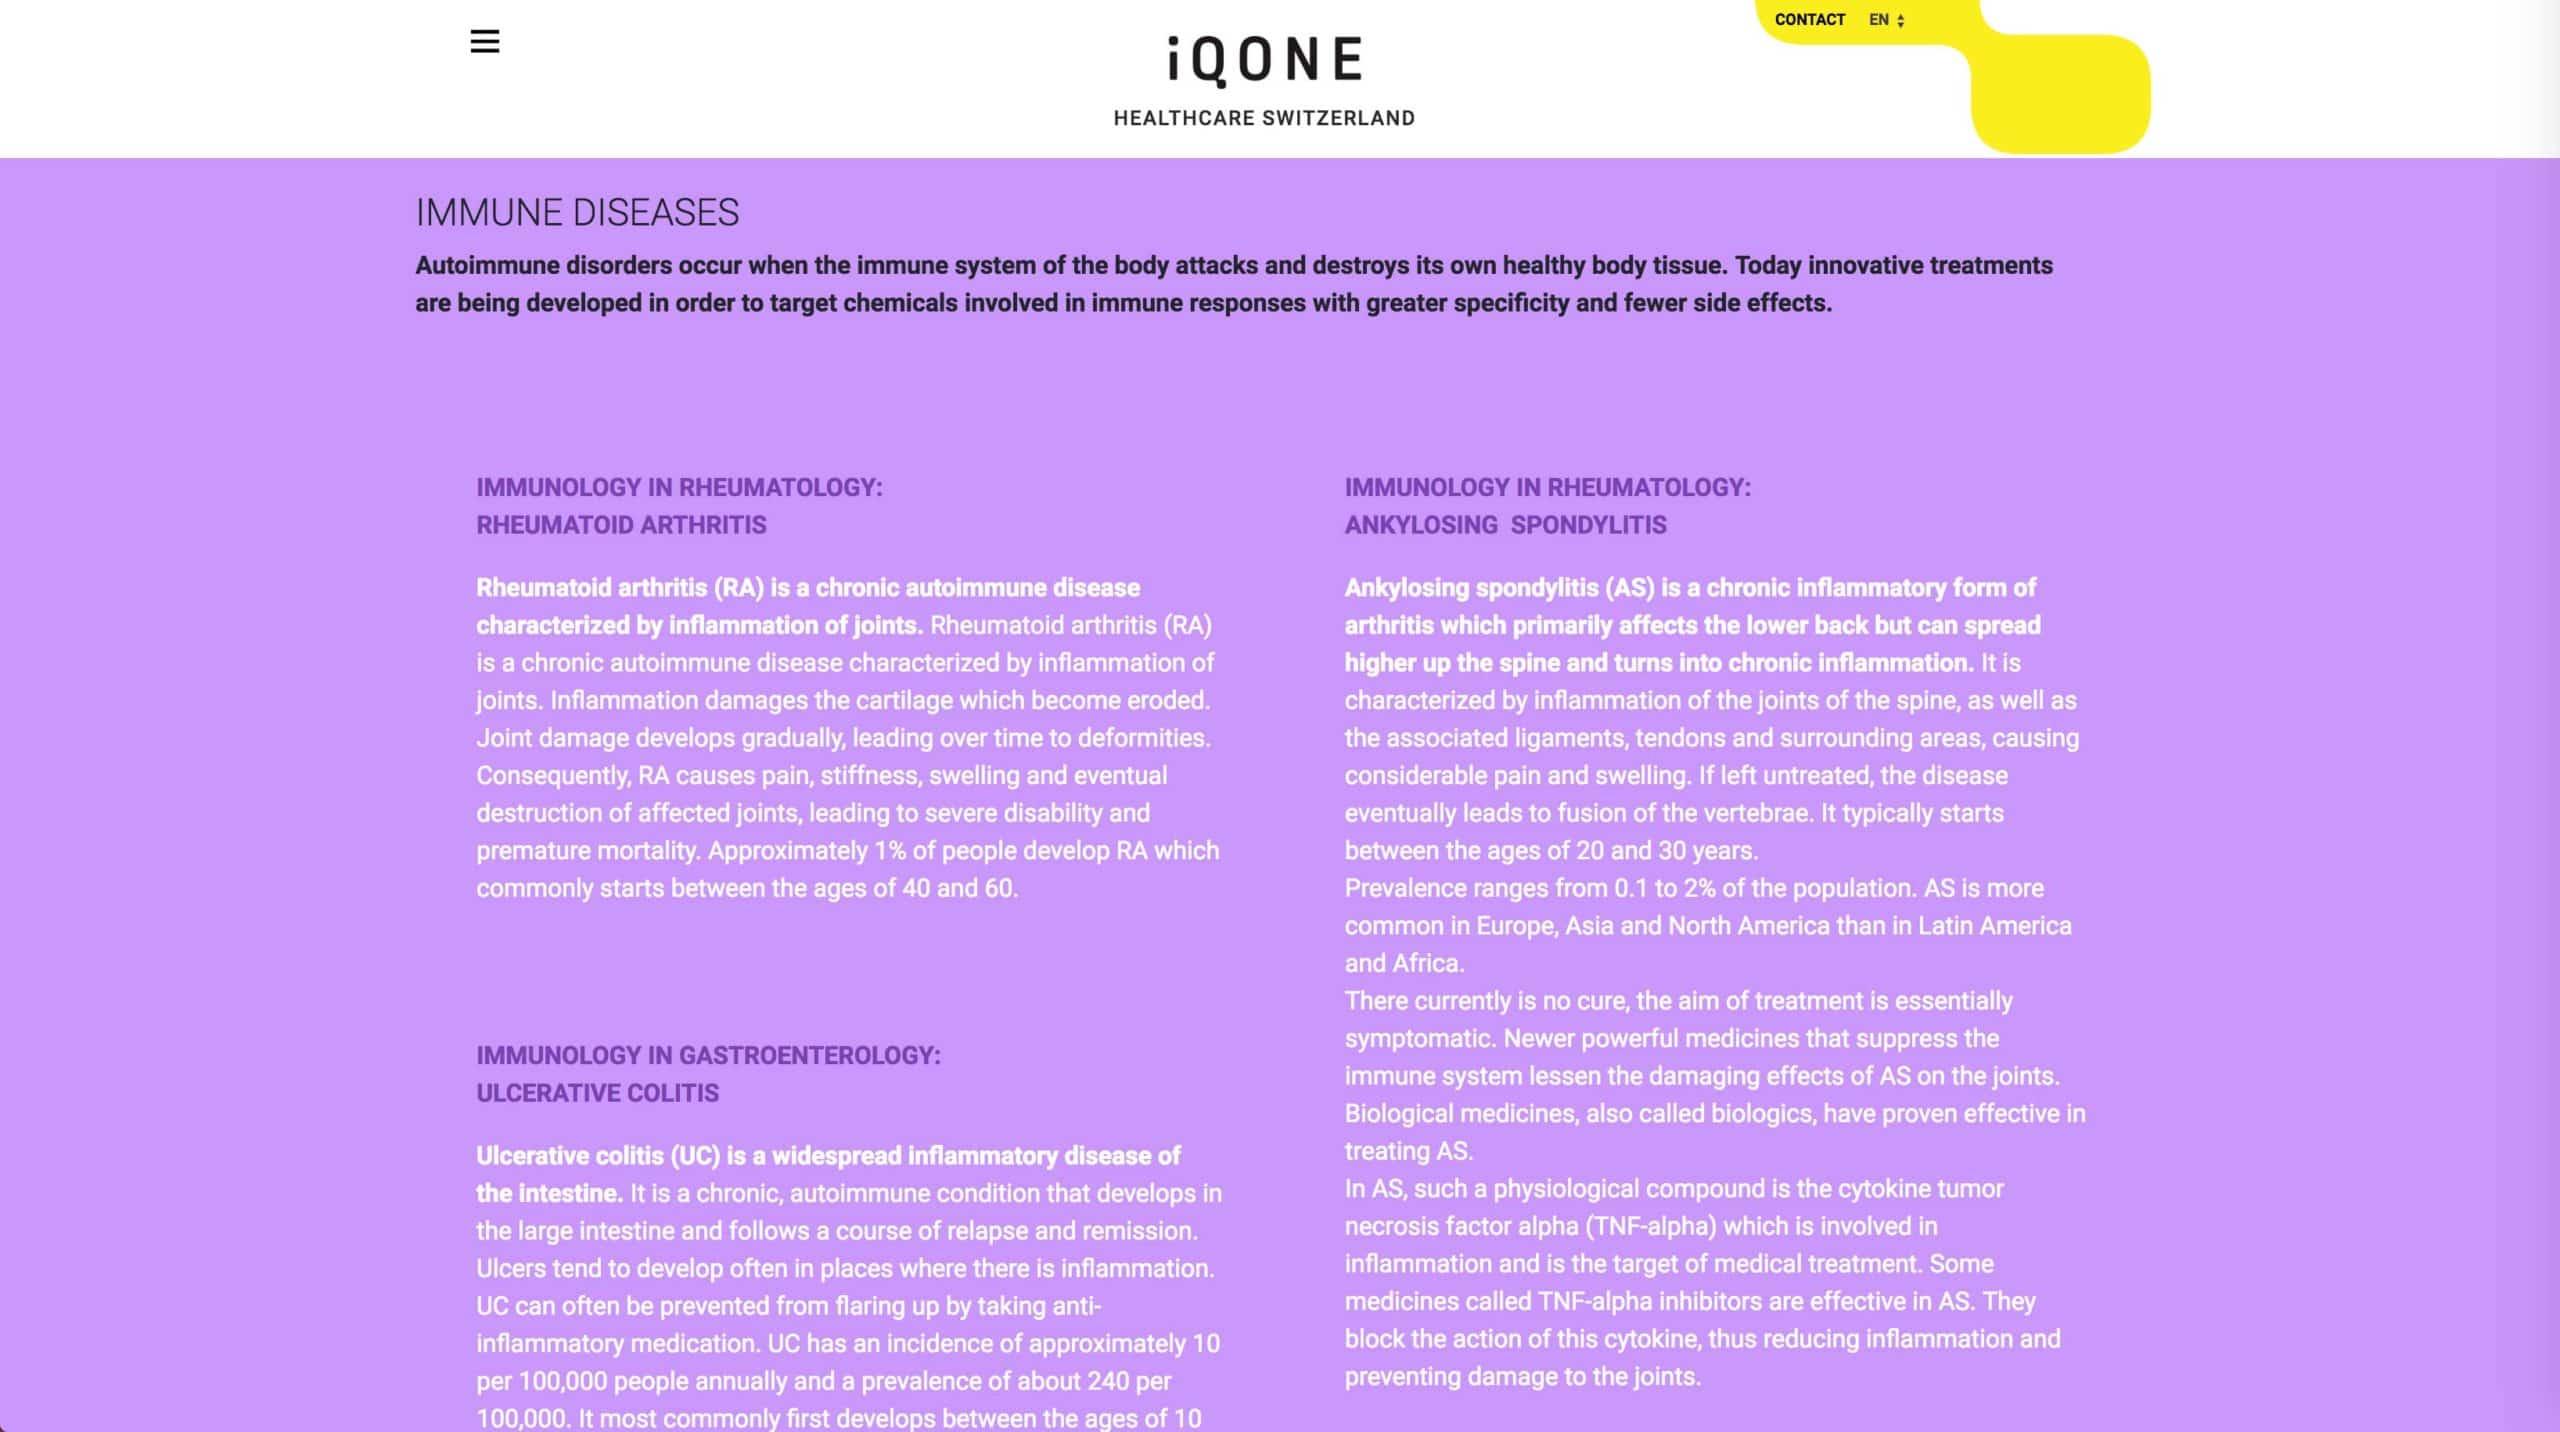 page iqone 1